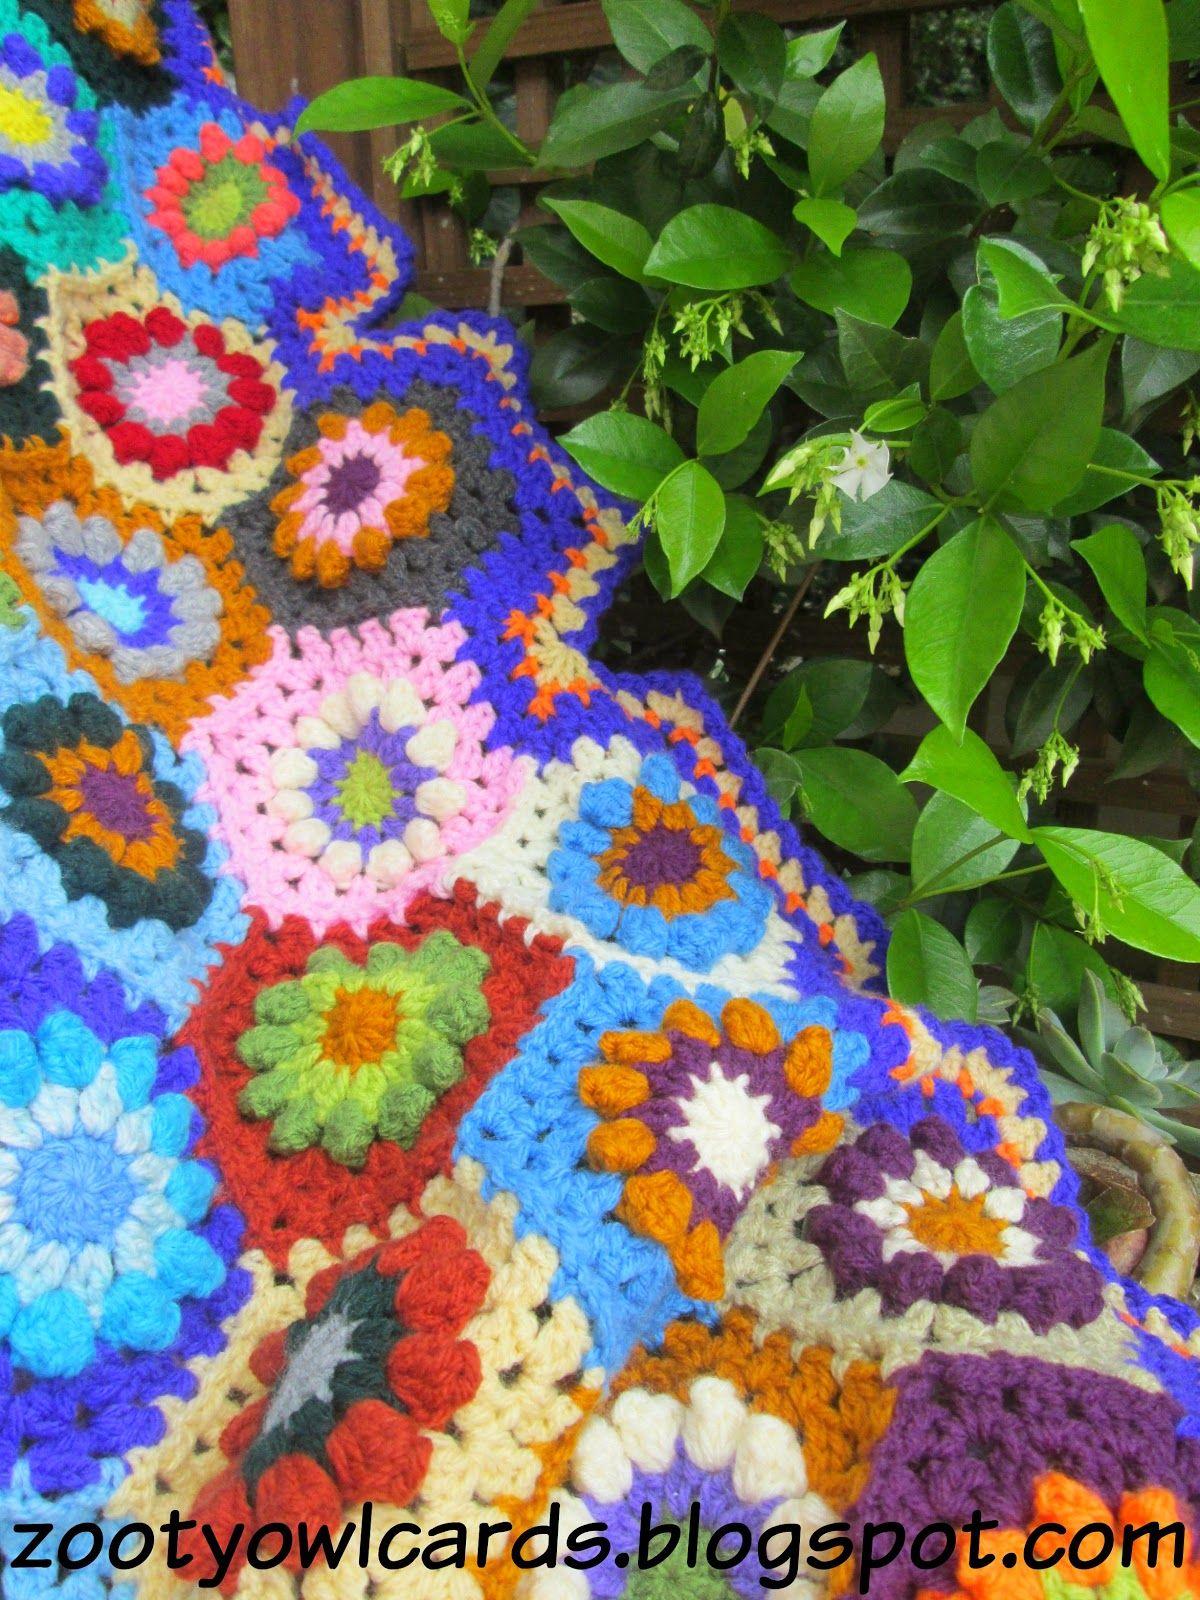 Zooty Owl's Crafty Blog: Kaleidoscope Blanket